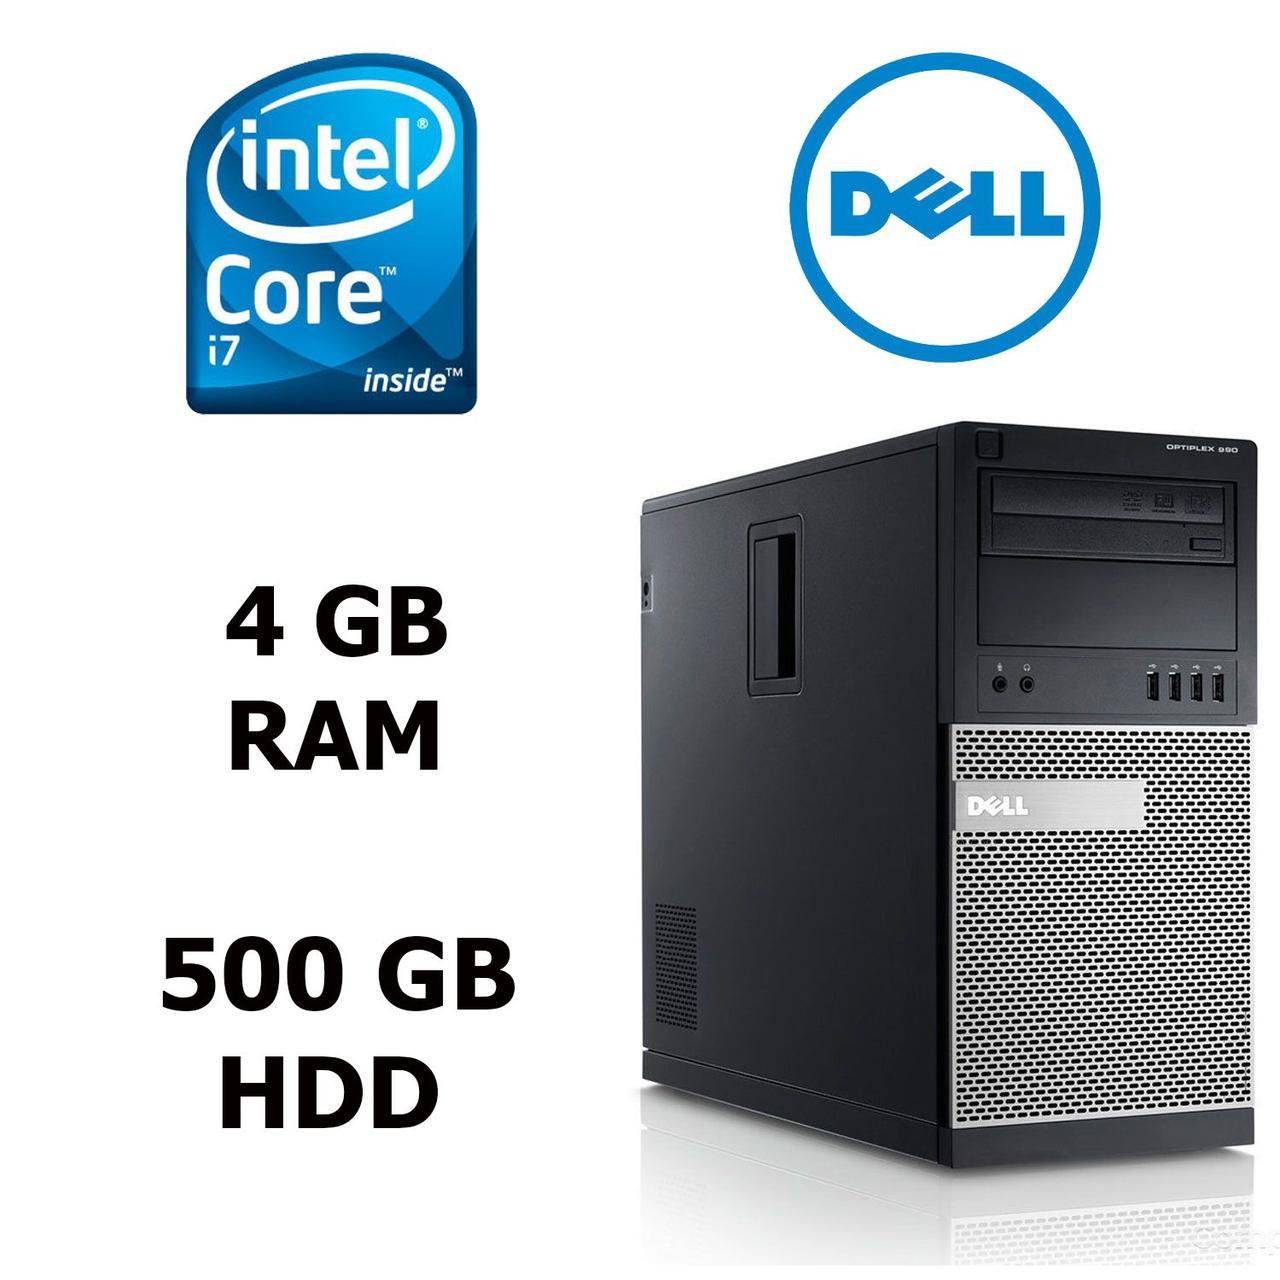 Dell Optiplex 990 Tower / Intel Core i7-2600 (4(8) ядра по 3.4 - 3.8 GHz) / 4GB DDR3/ 500 HDD